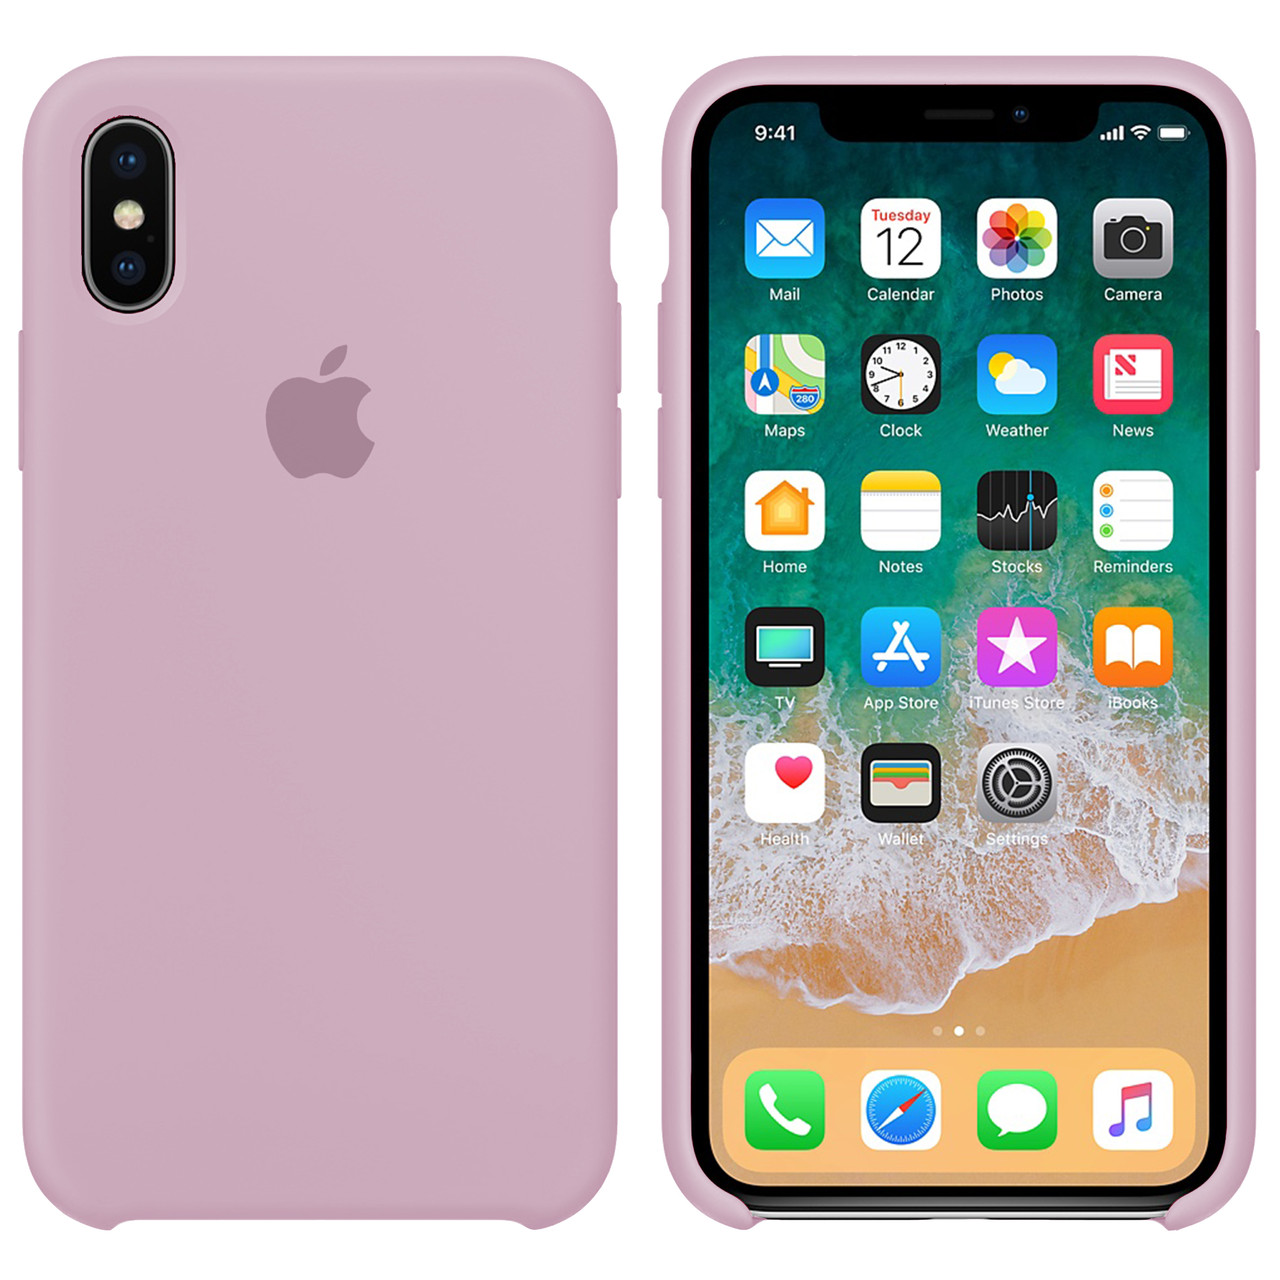 Силиконовый чехол для Apple iPhone XS Max Silicone case (Пудра)